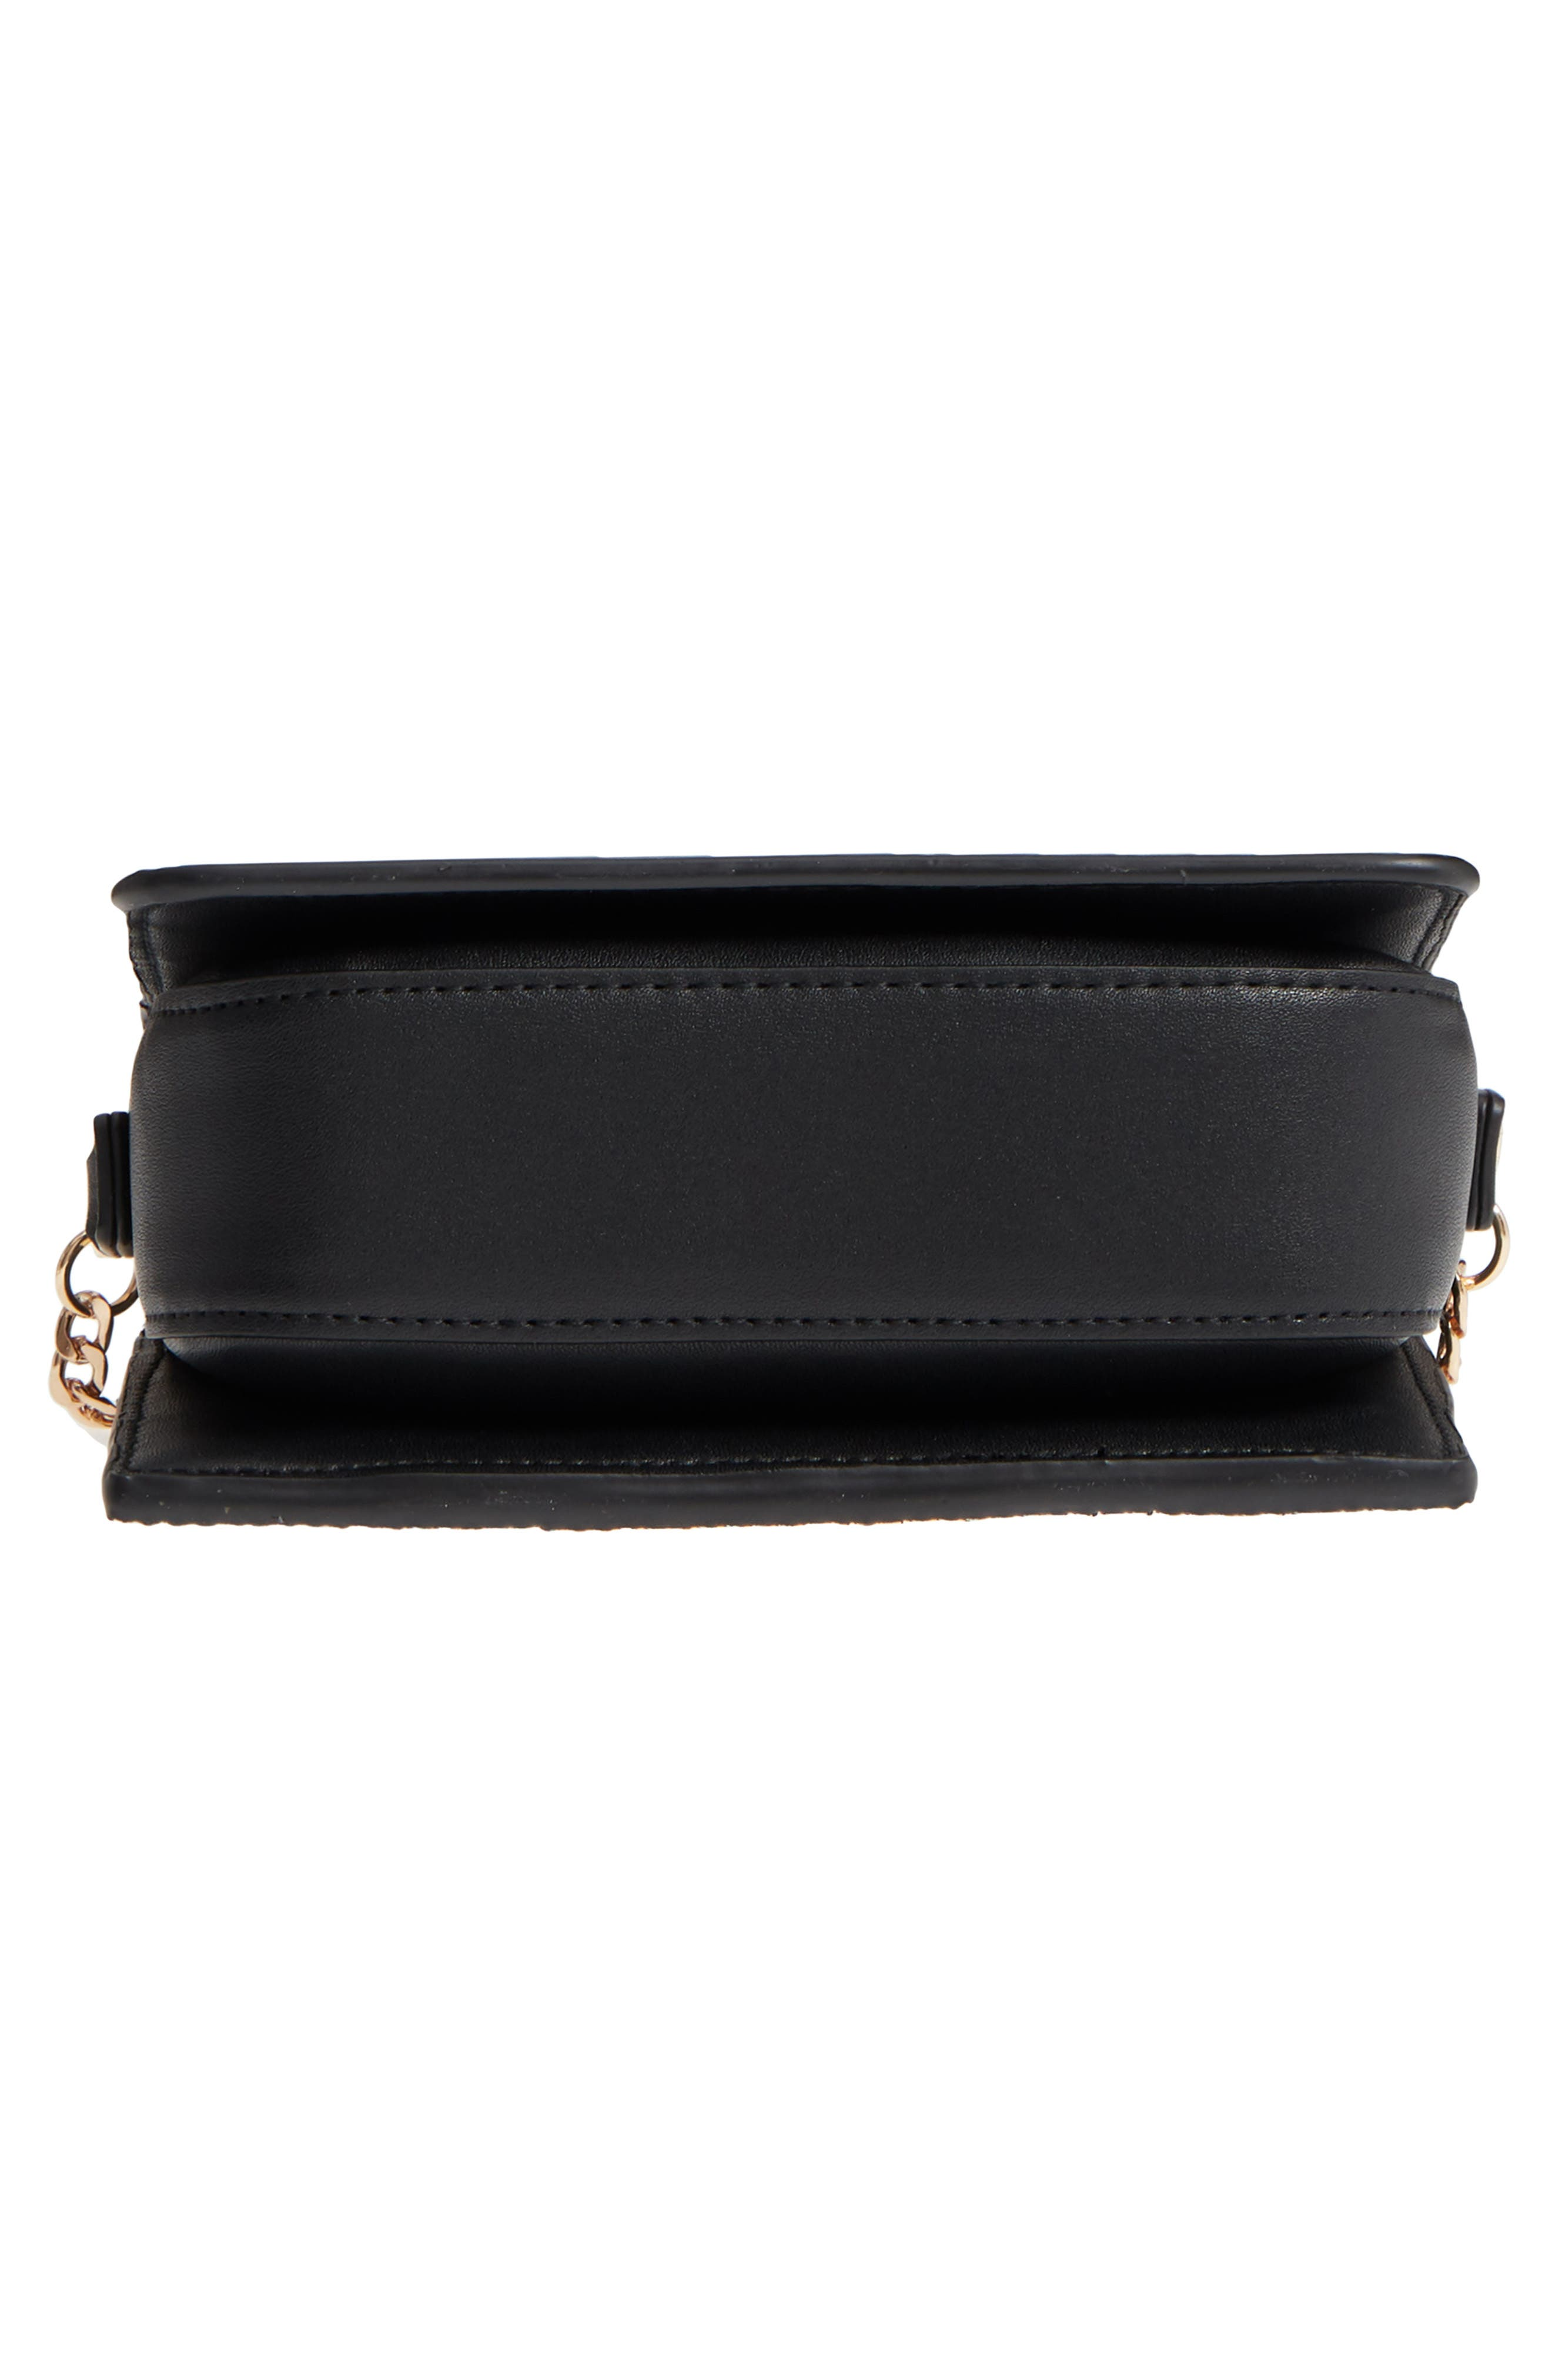 Rosie Diamante Rainbow Crossbody Bag,                             Alternate thumbnail 6, color,                             Black Multi